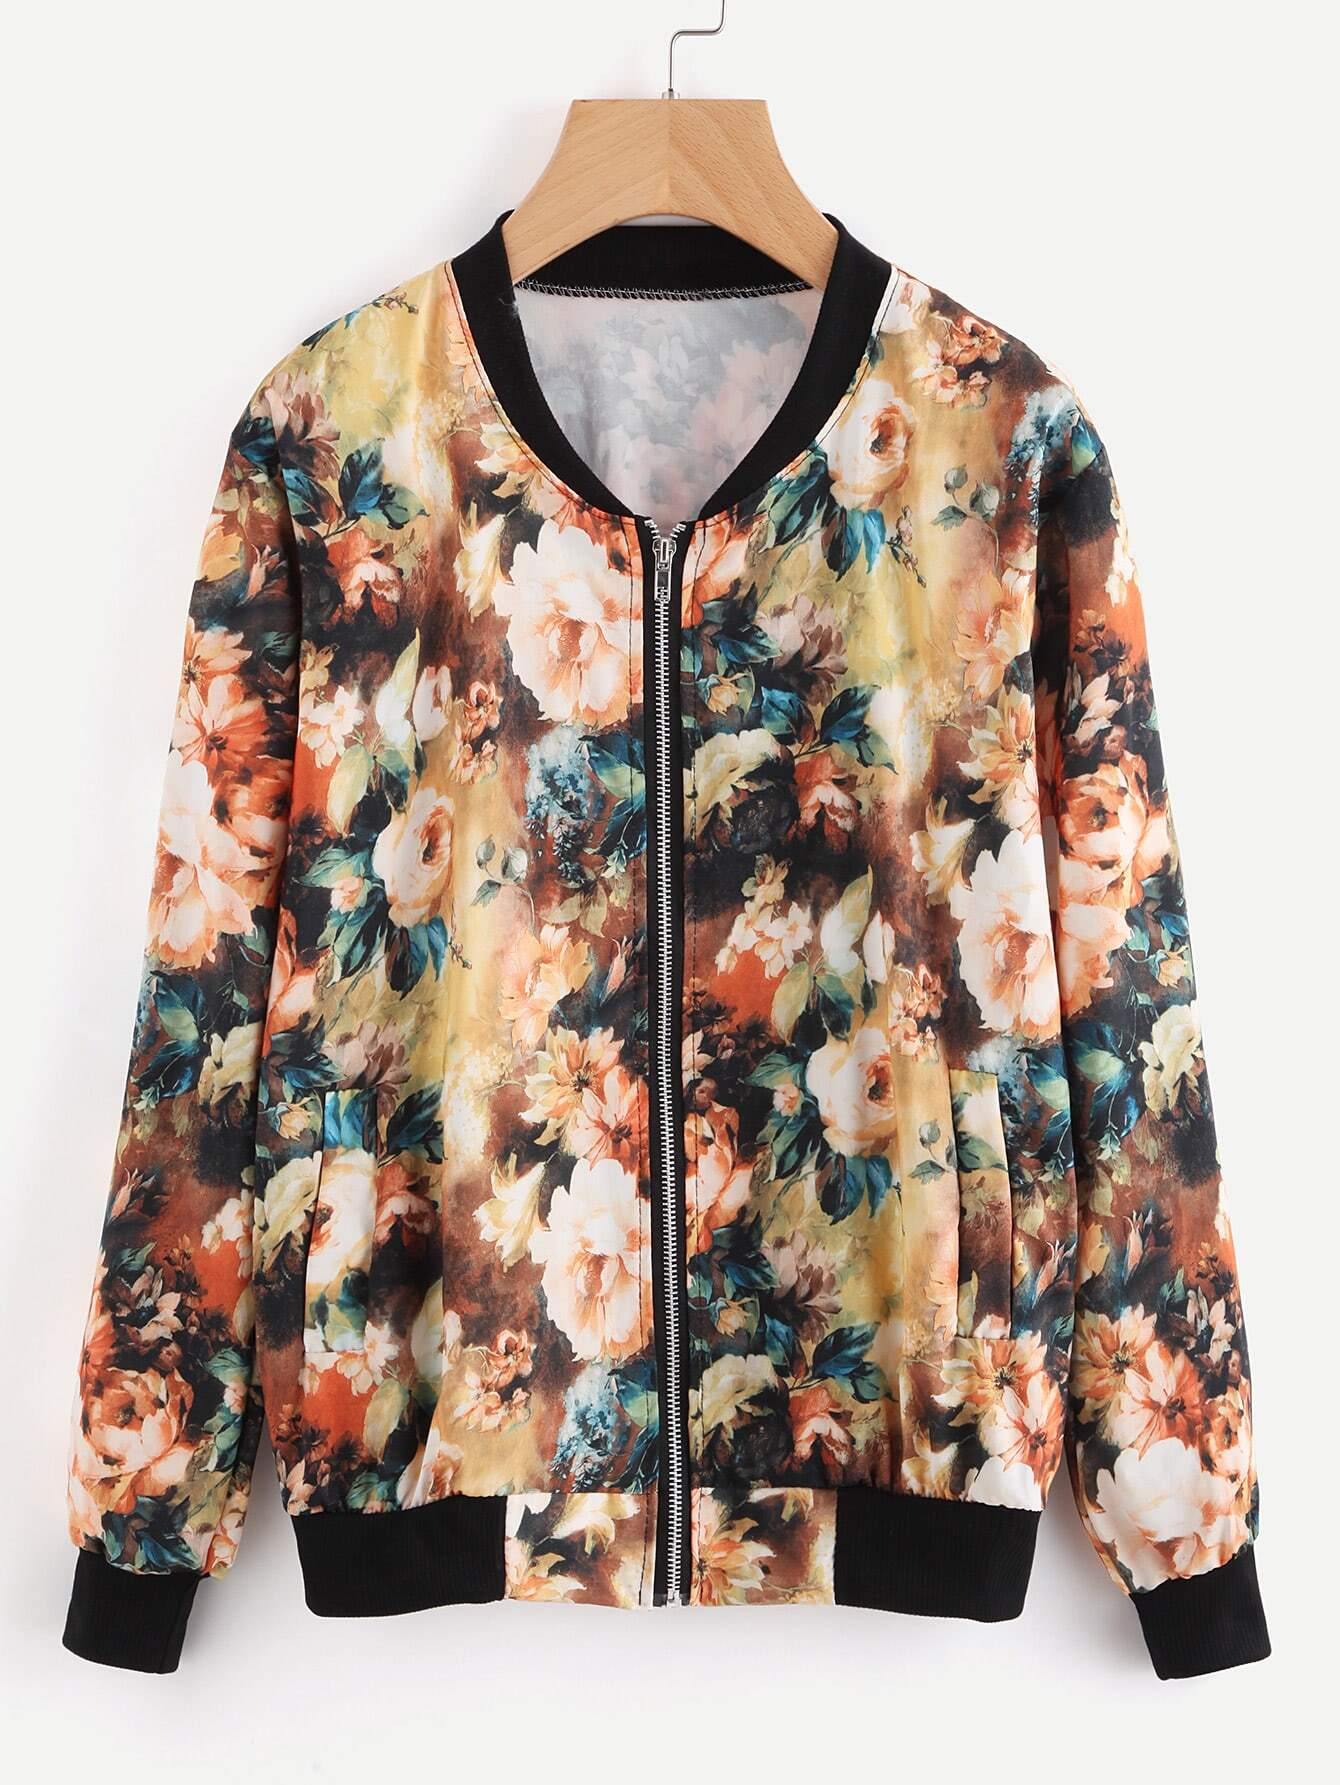 Contrast Ribbed Trim Allover Florals Jacket contrast ribbed trim jacket